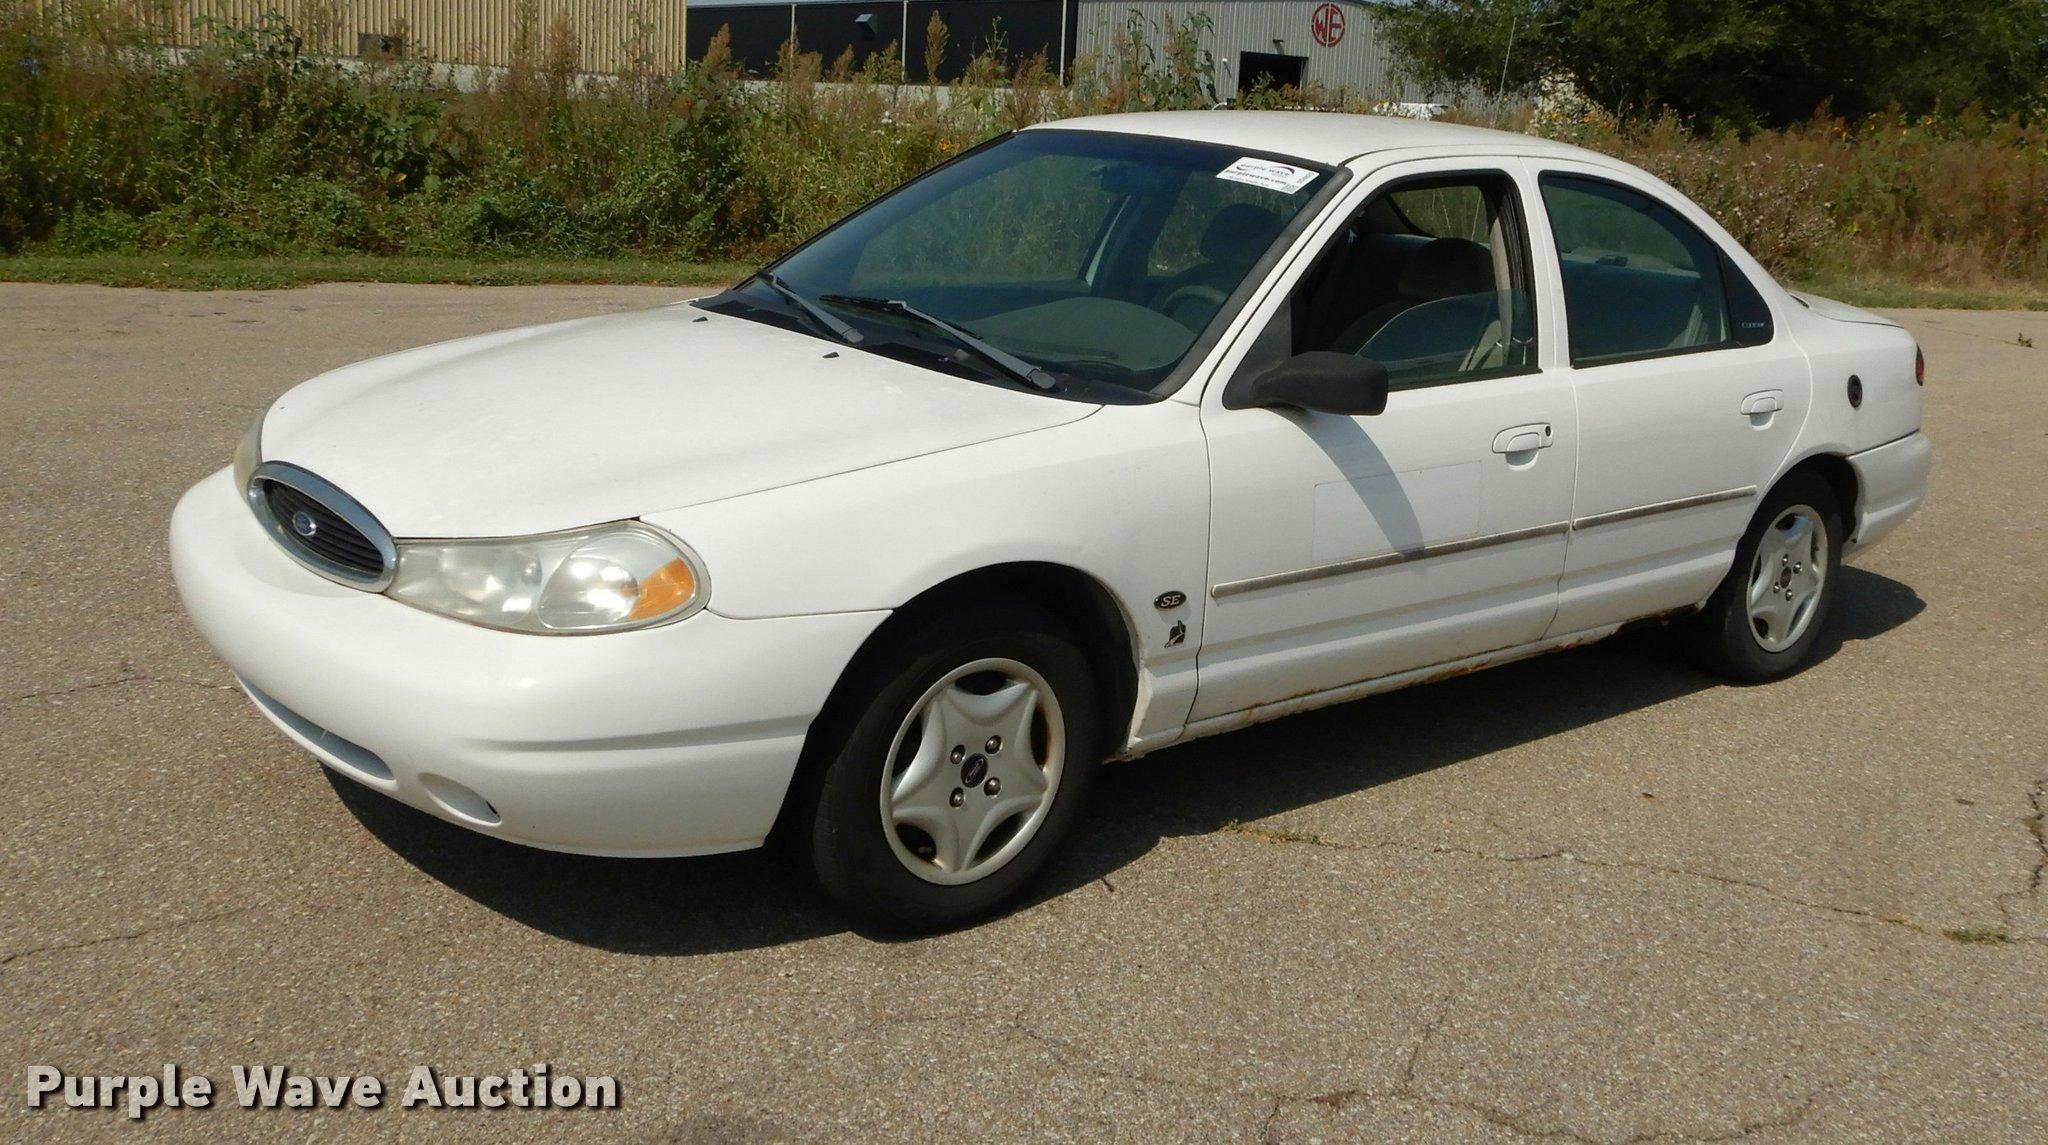 2000 ford contour se item dd0825 sold october 3 governm rh purplewave com Ford Contour Engine Ford Contour Interior